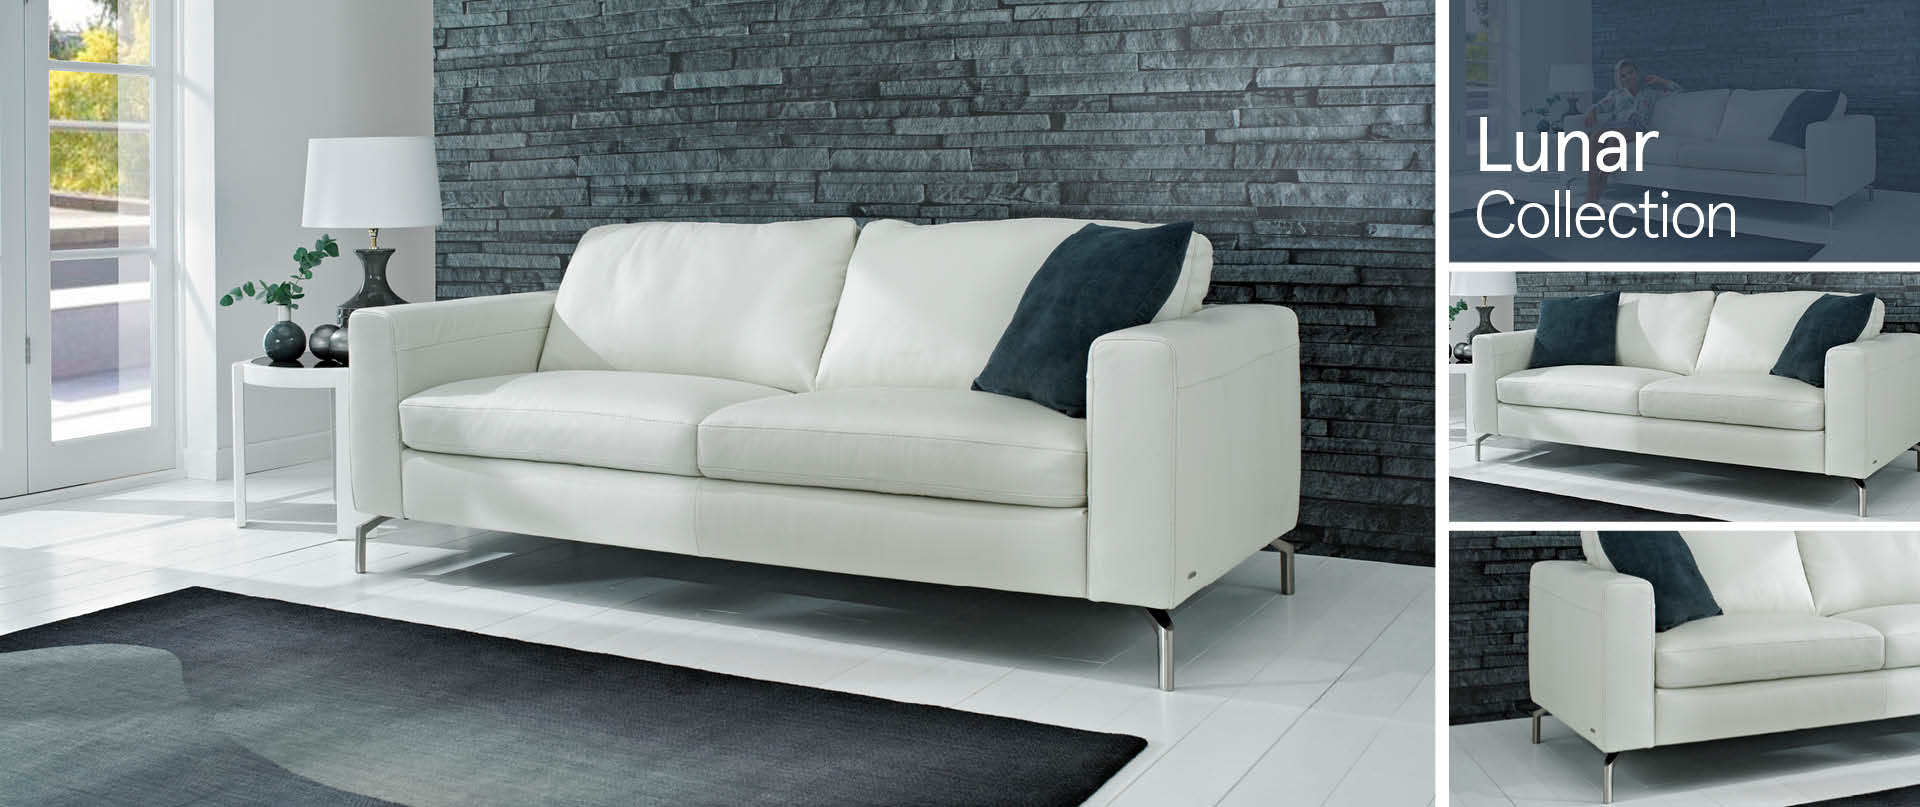 Lunar All-Leather-Sofa-Ranges Ranges